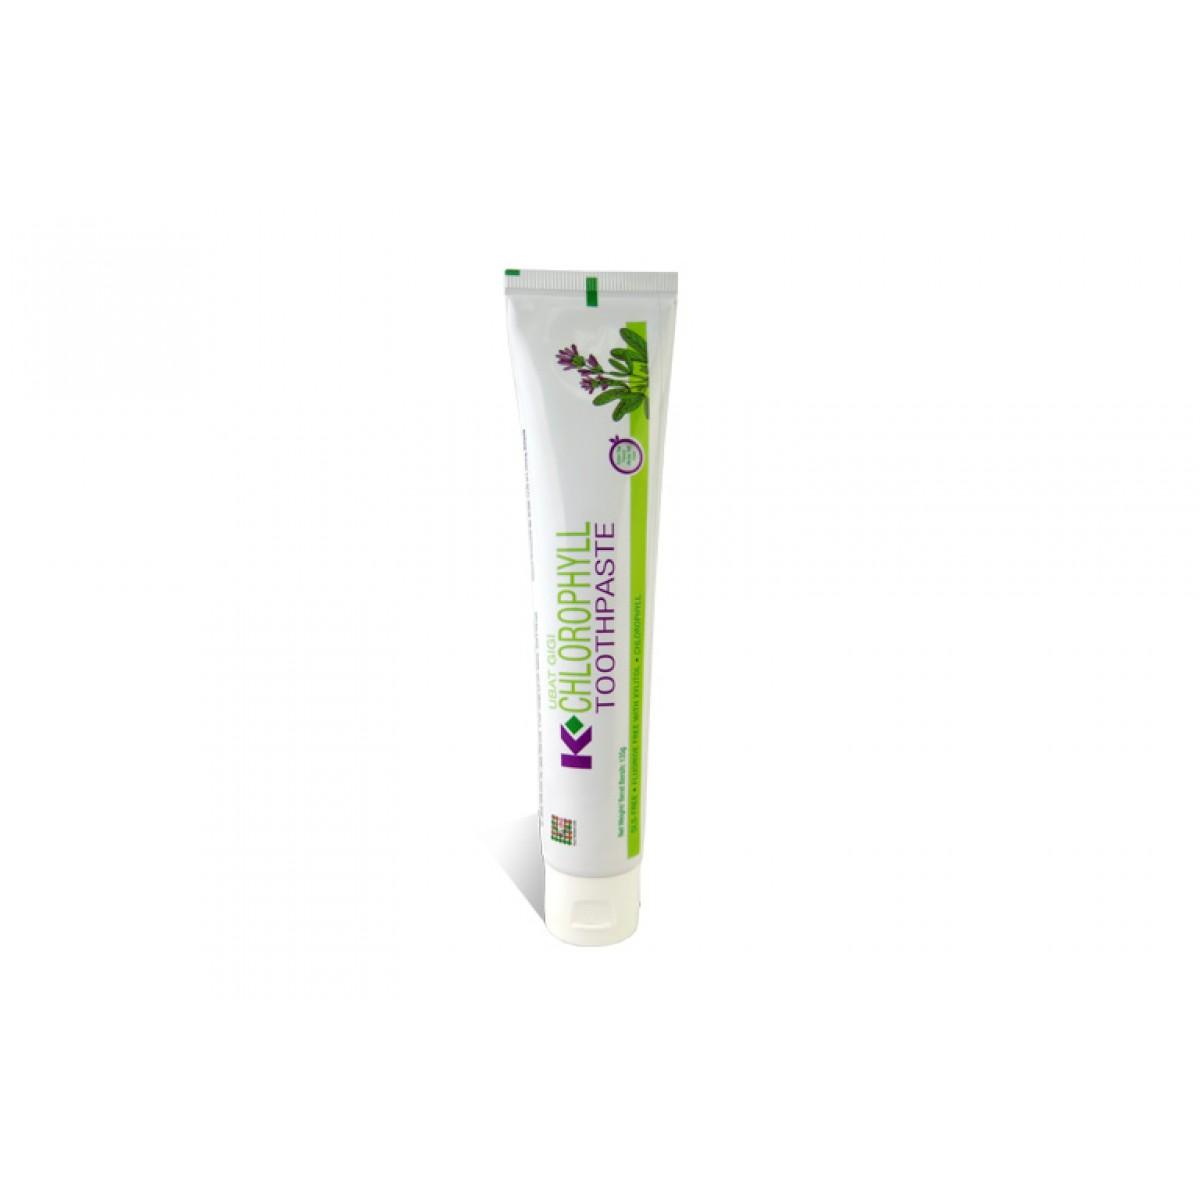 K-Chlorophyll Toothpaste